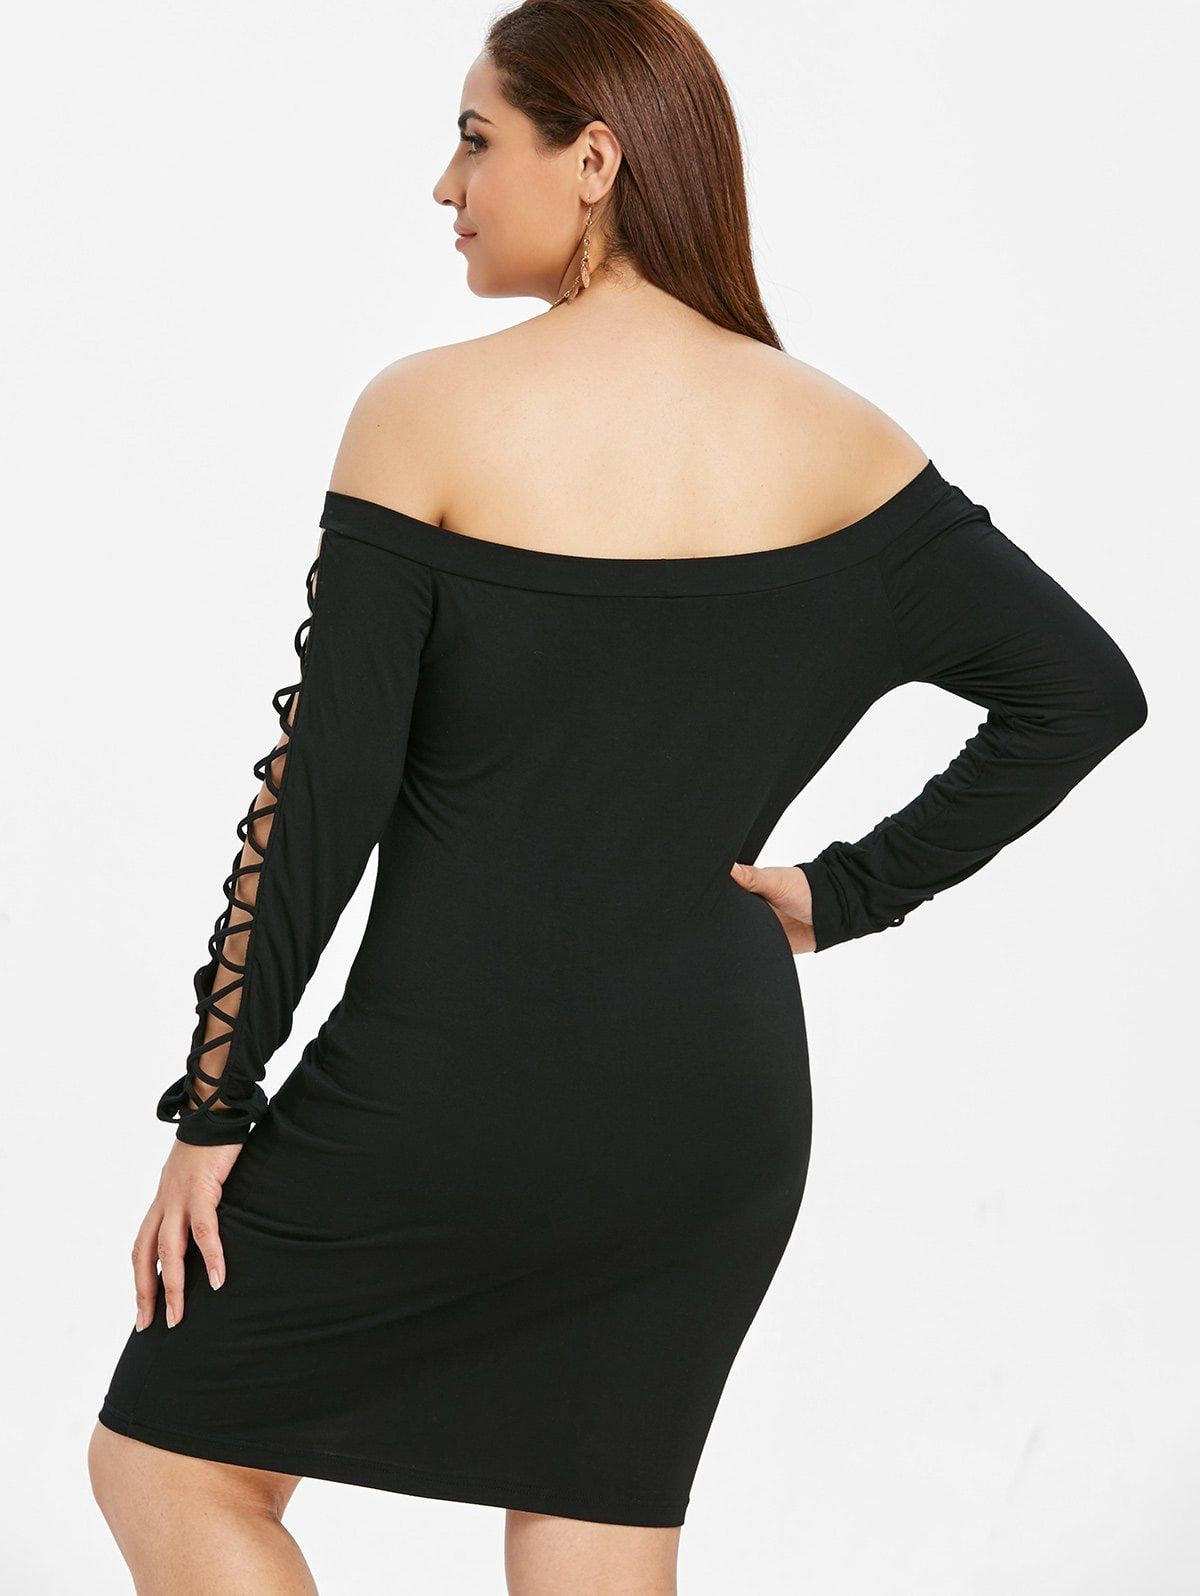 Plus Size Off The Shoulder Criss Cross Bodycon Dress Ad Affiliate Criss Shoulder Size Dress Bodycon Dresses Bodycon Dress Bodycon Mini Dress